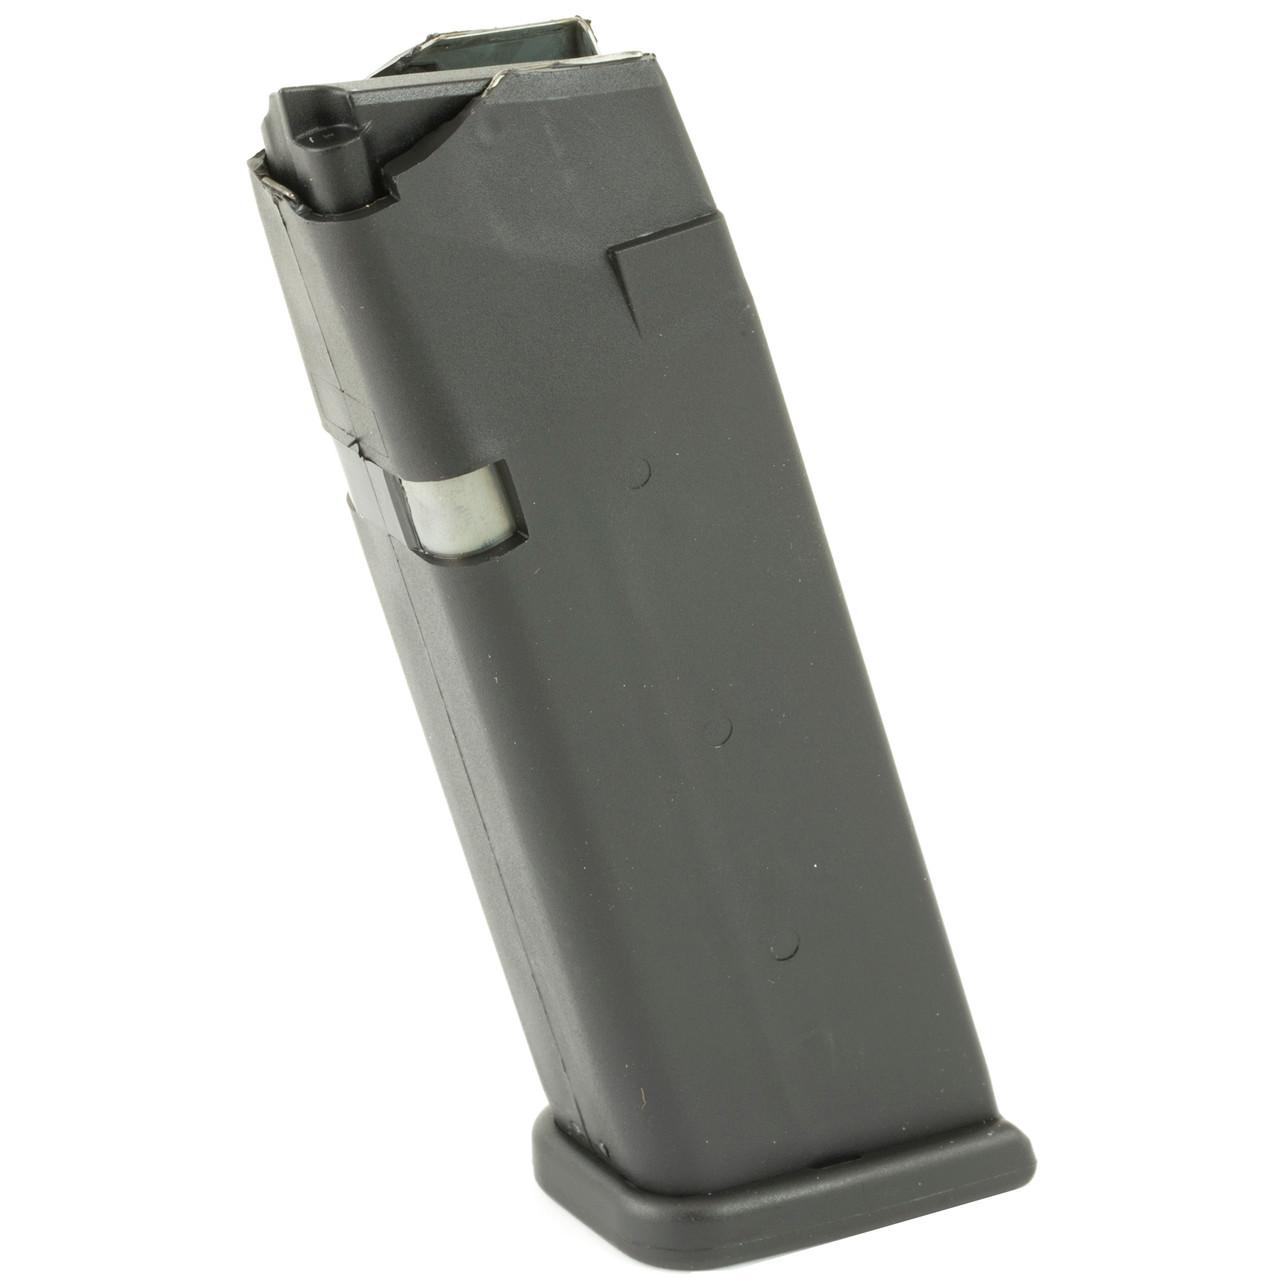 Glock OEM G21 45ACP 10rd Magazine